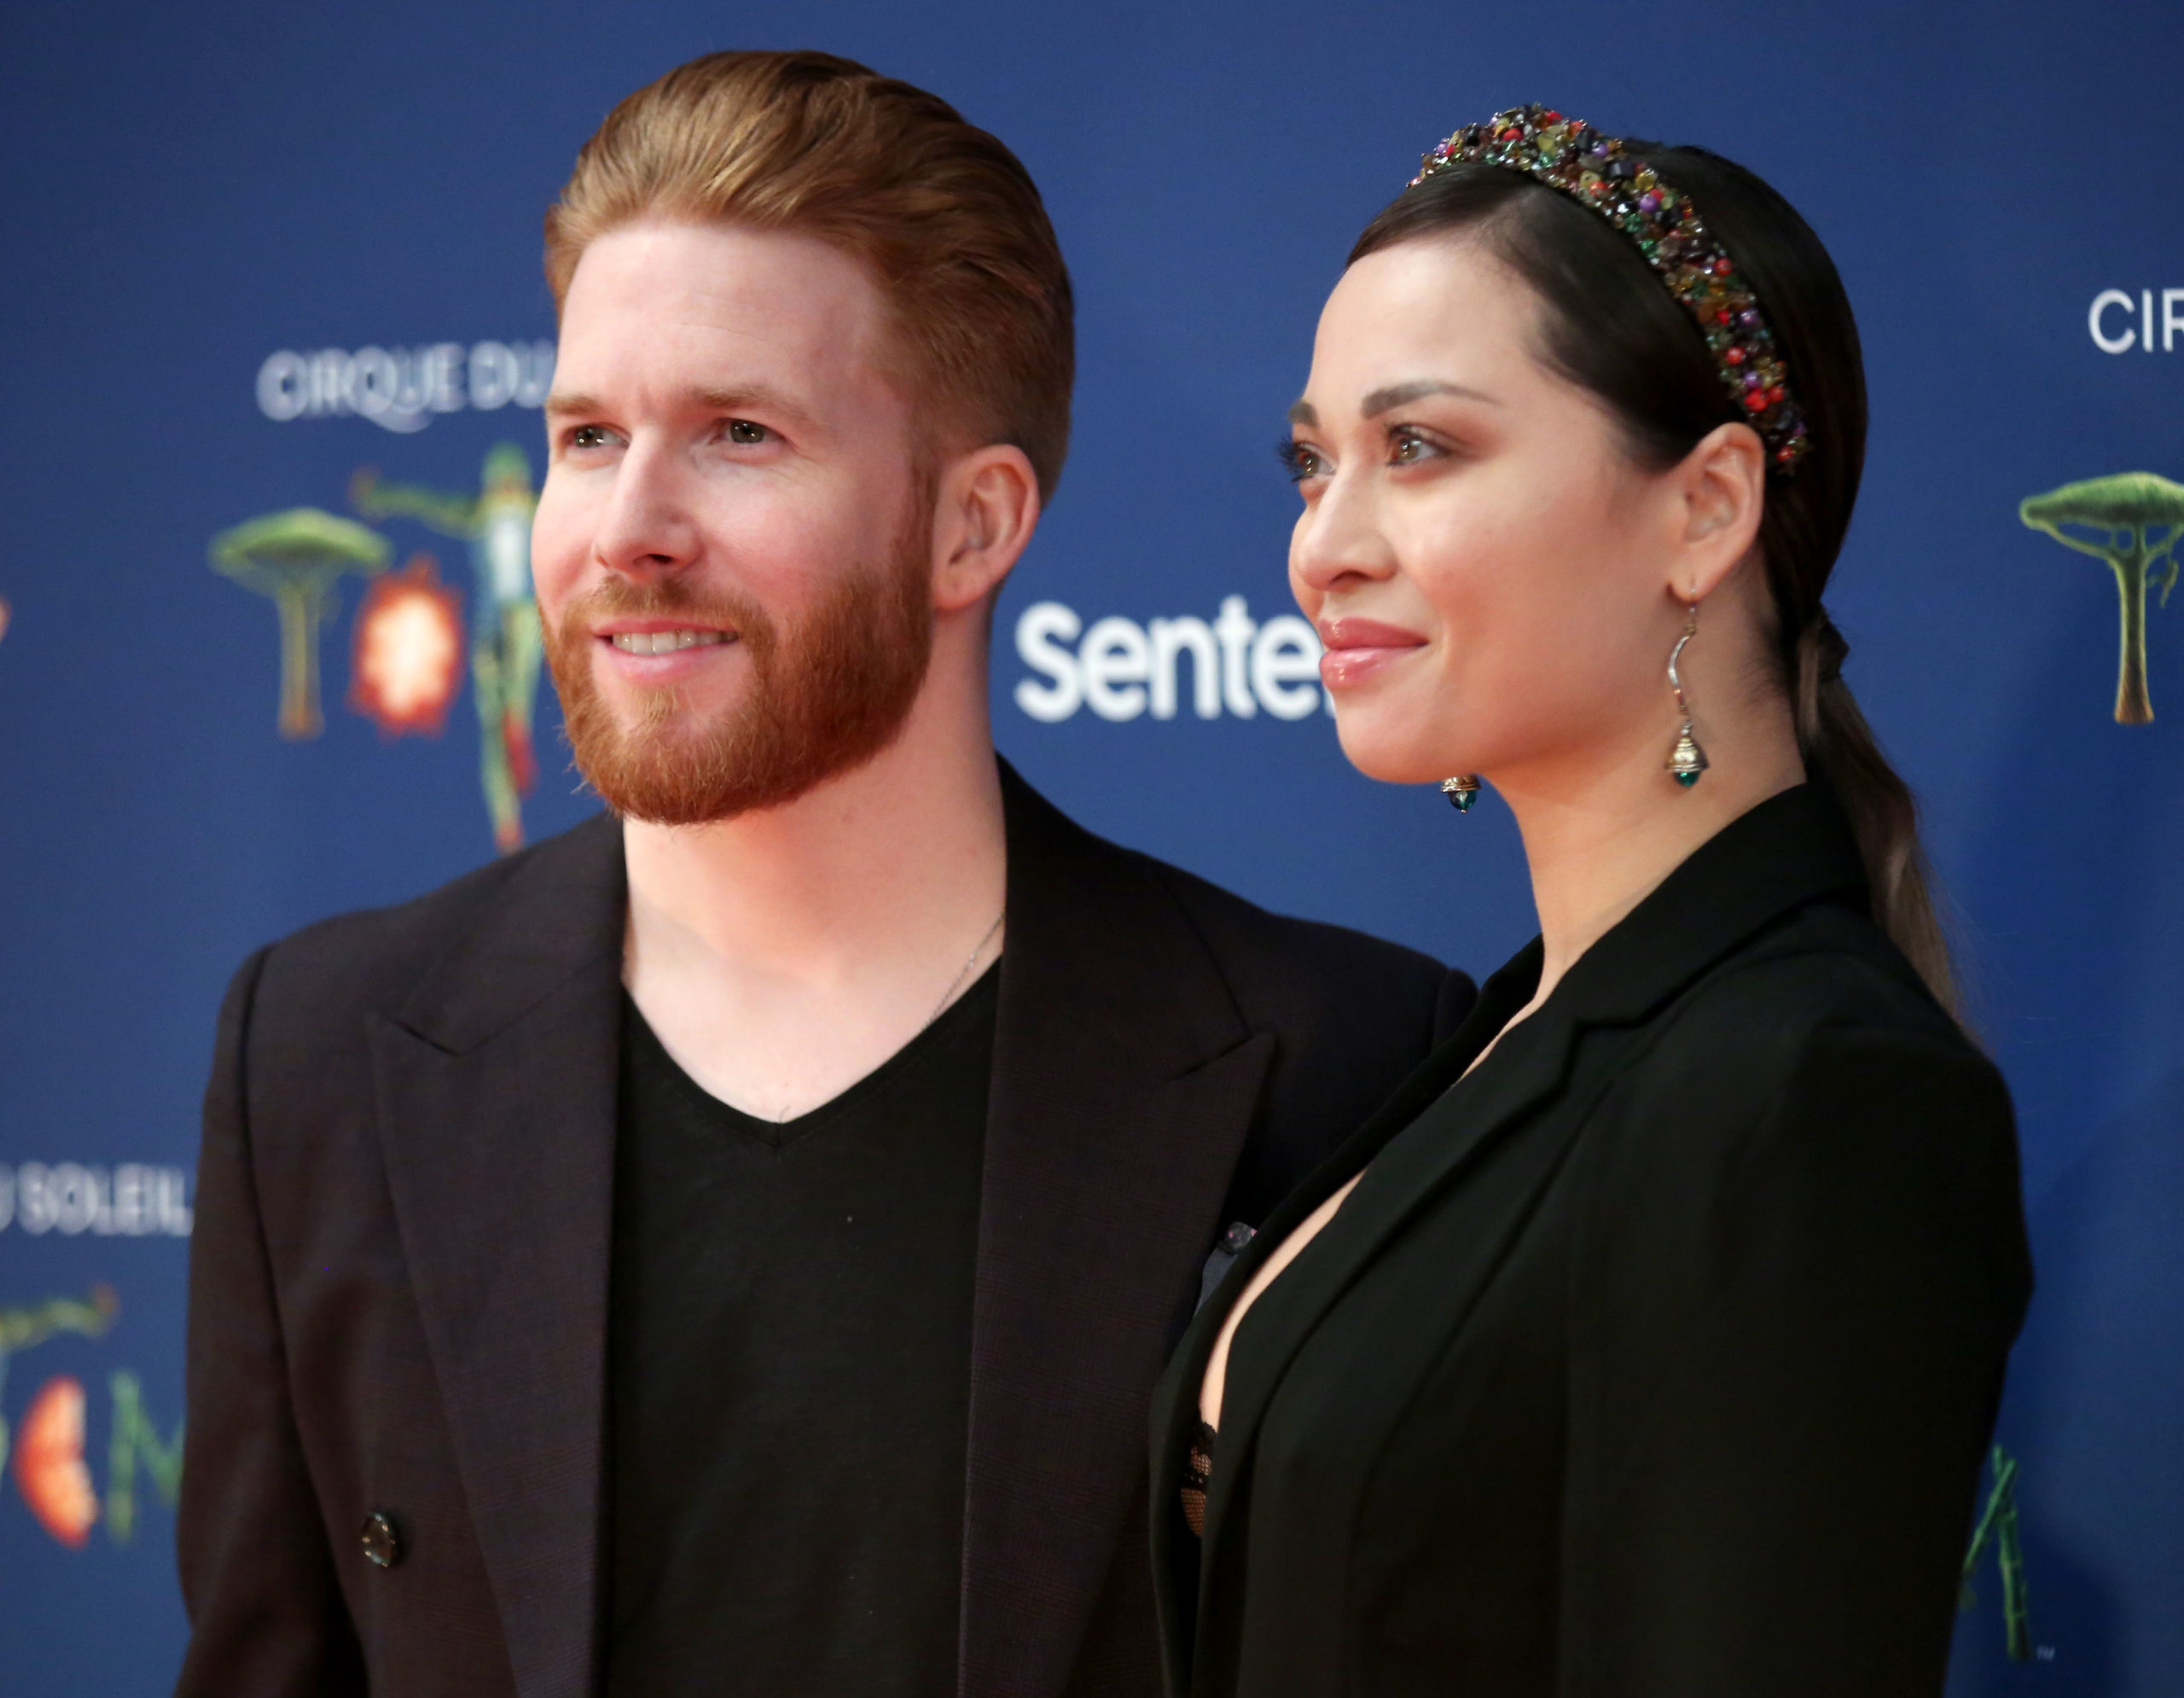 Neil Jones said the Seann Walsh kiss wasn't the reason he split from wife Katya.